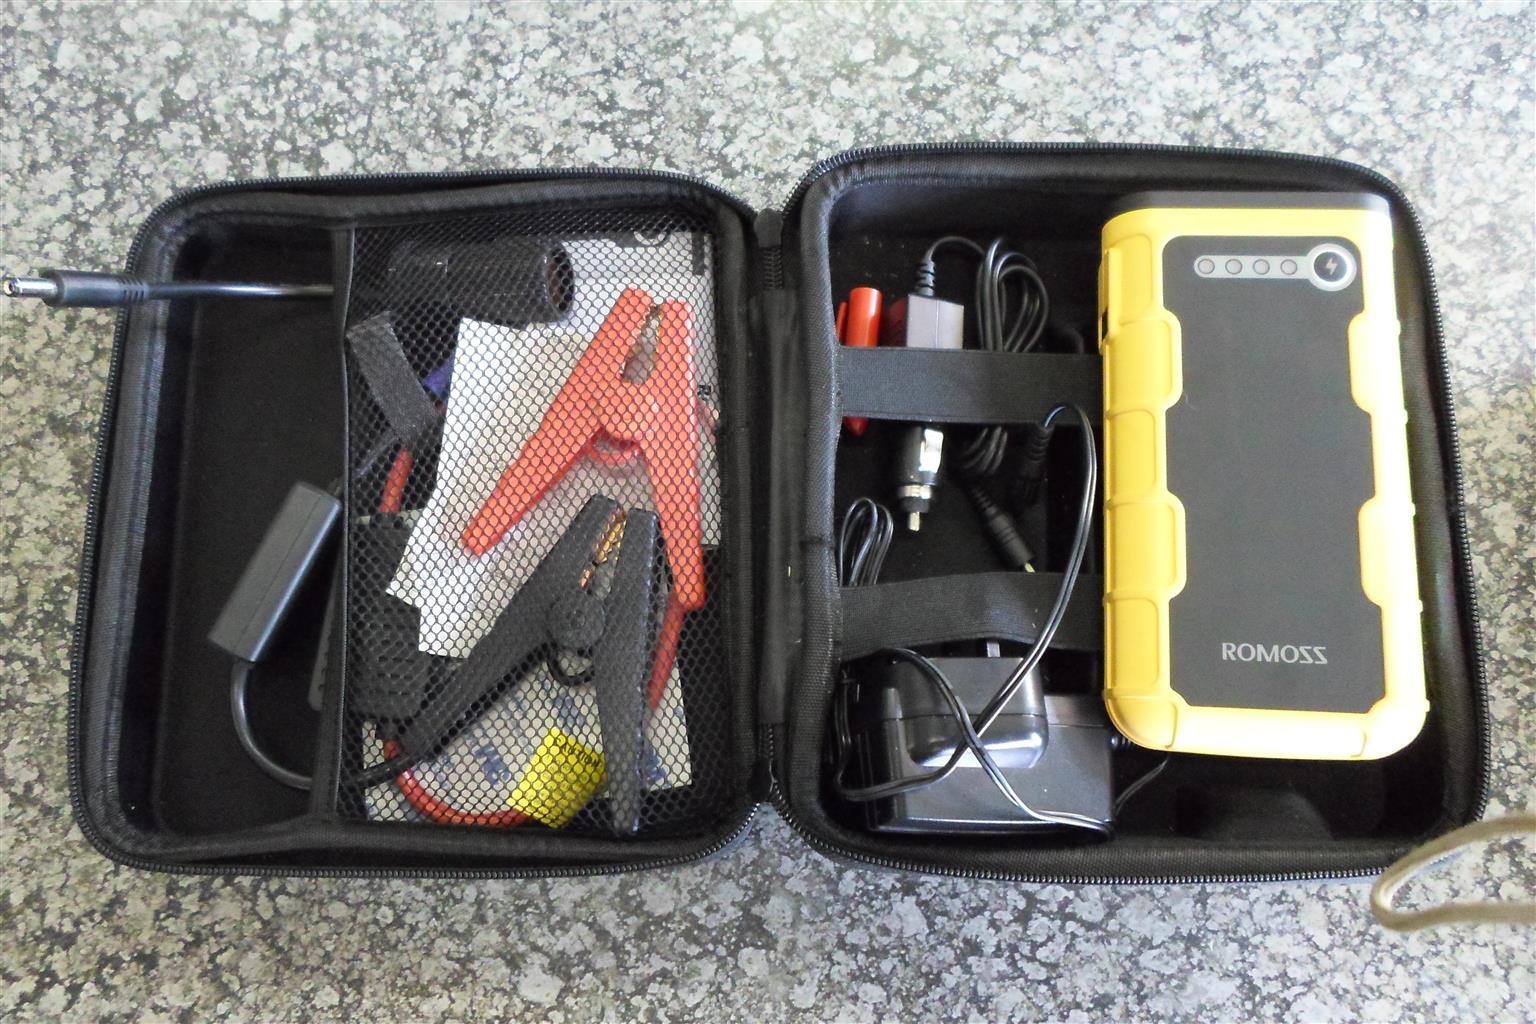 Romoss Jump Start Kit